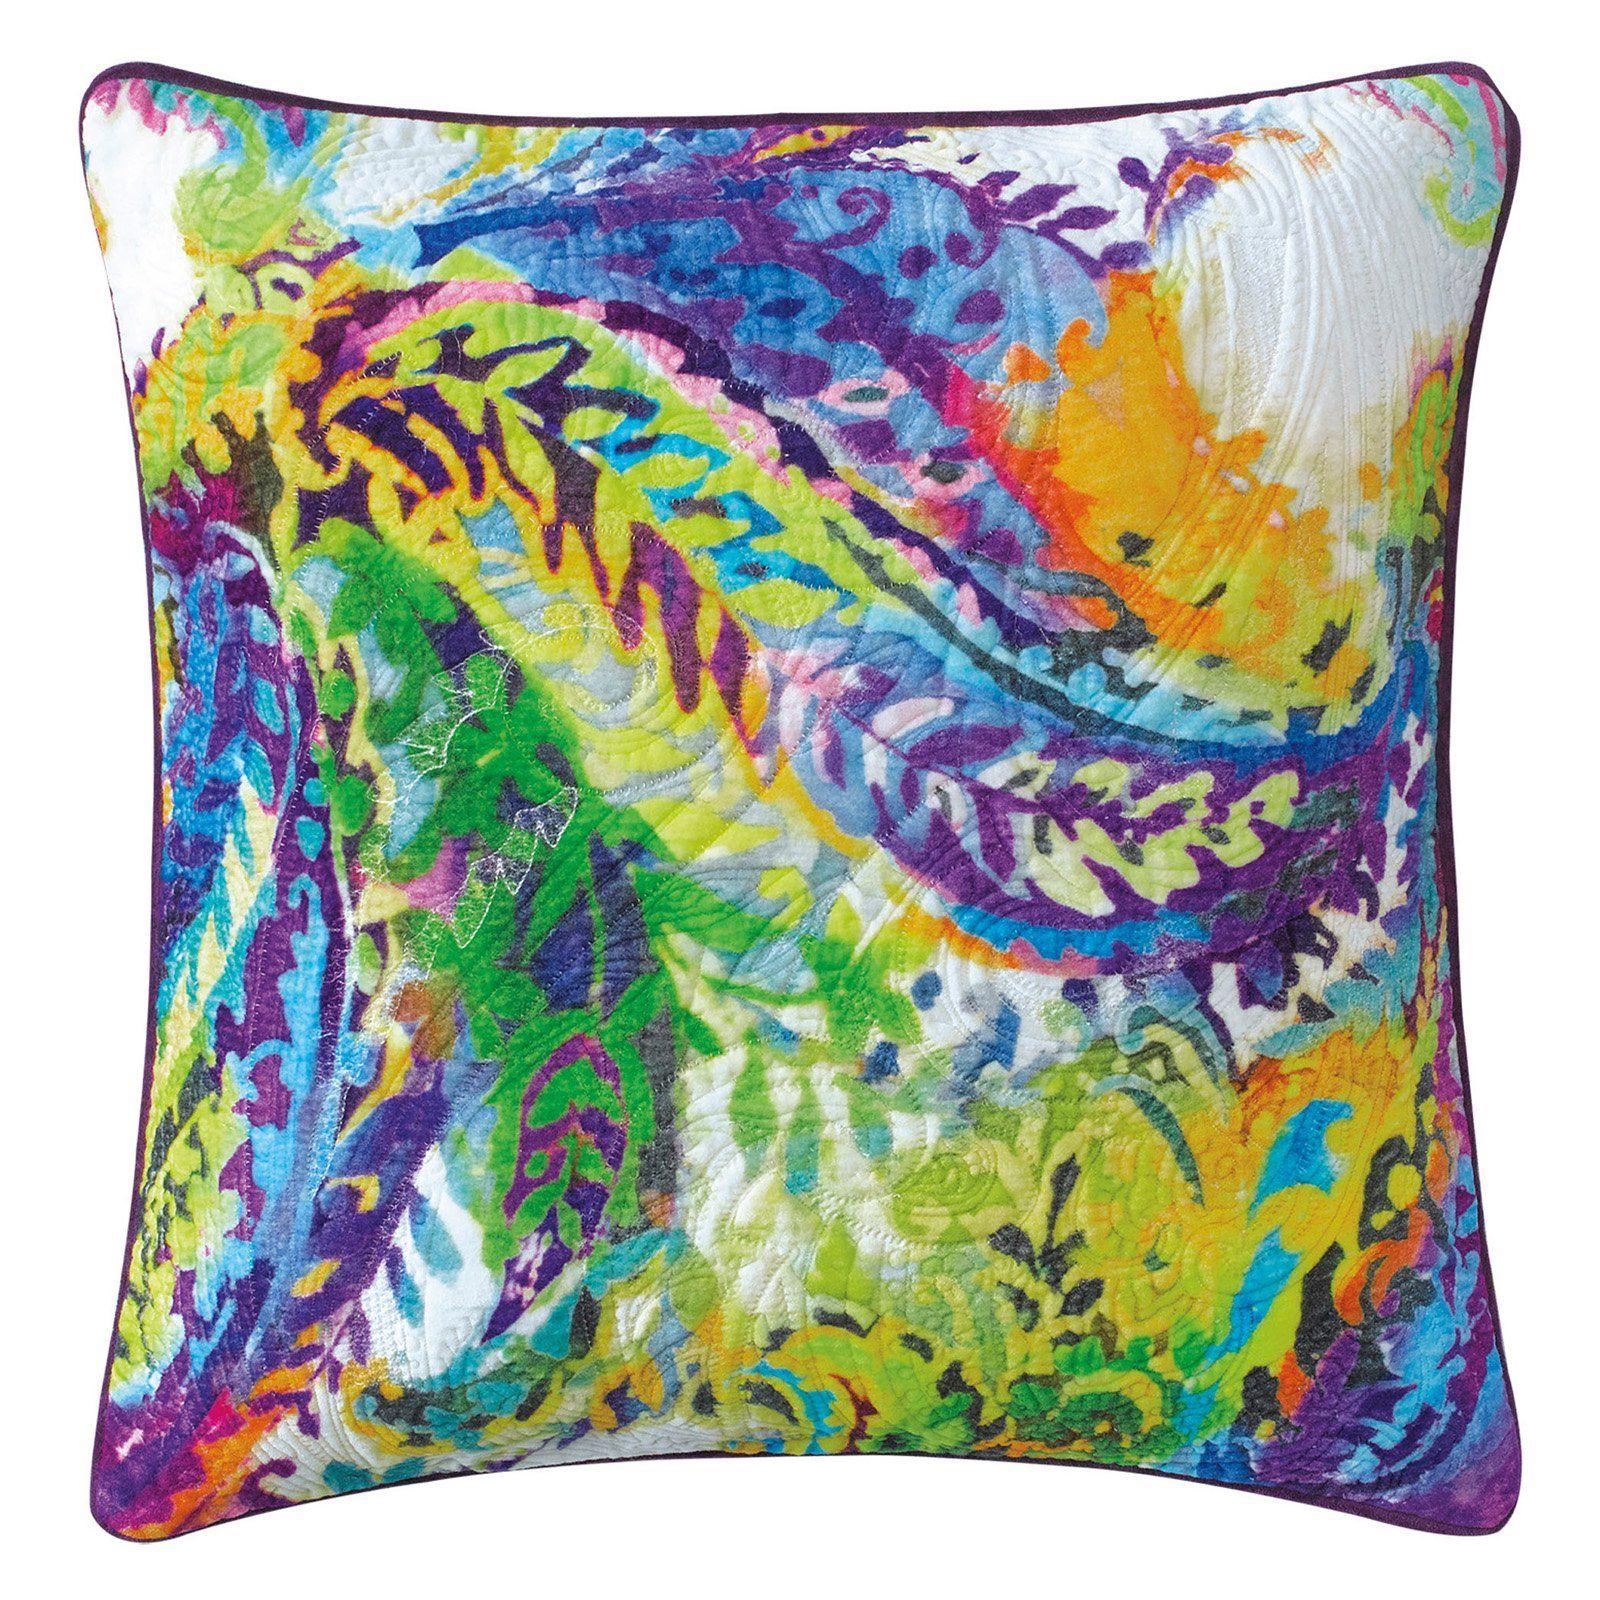 Company c galleria decorative pillow kmultx products